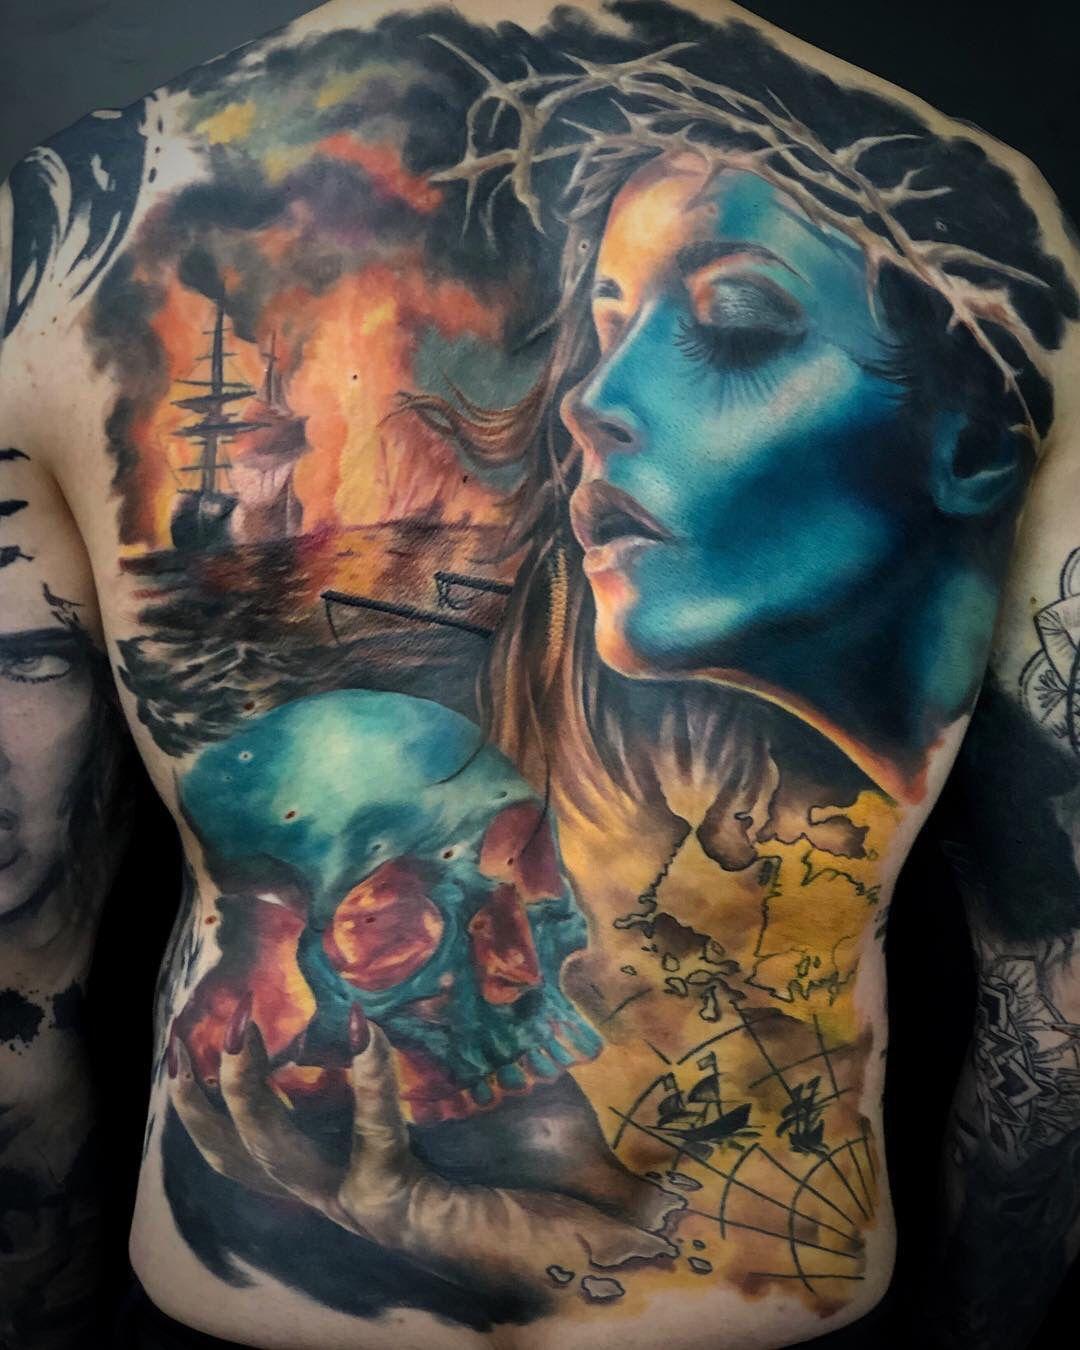 Colour realism back tattoo realismtattoo colourtattoo